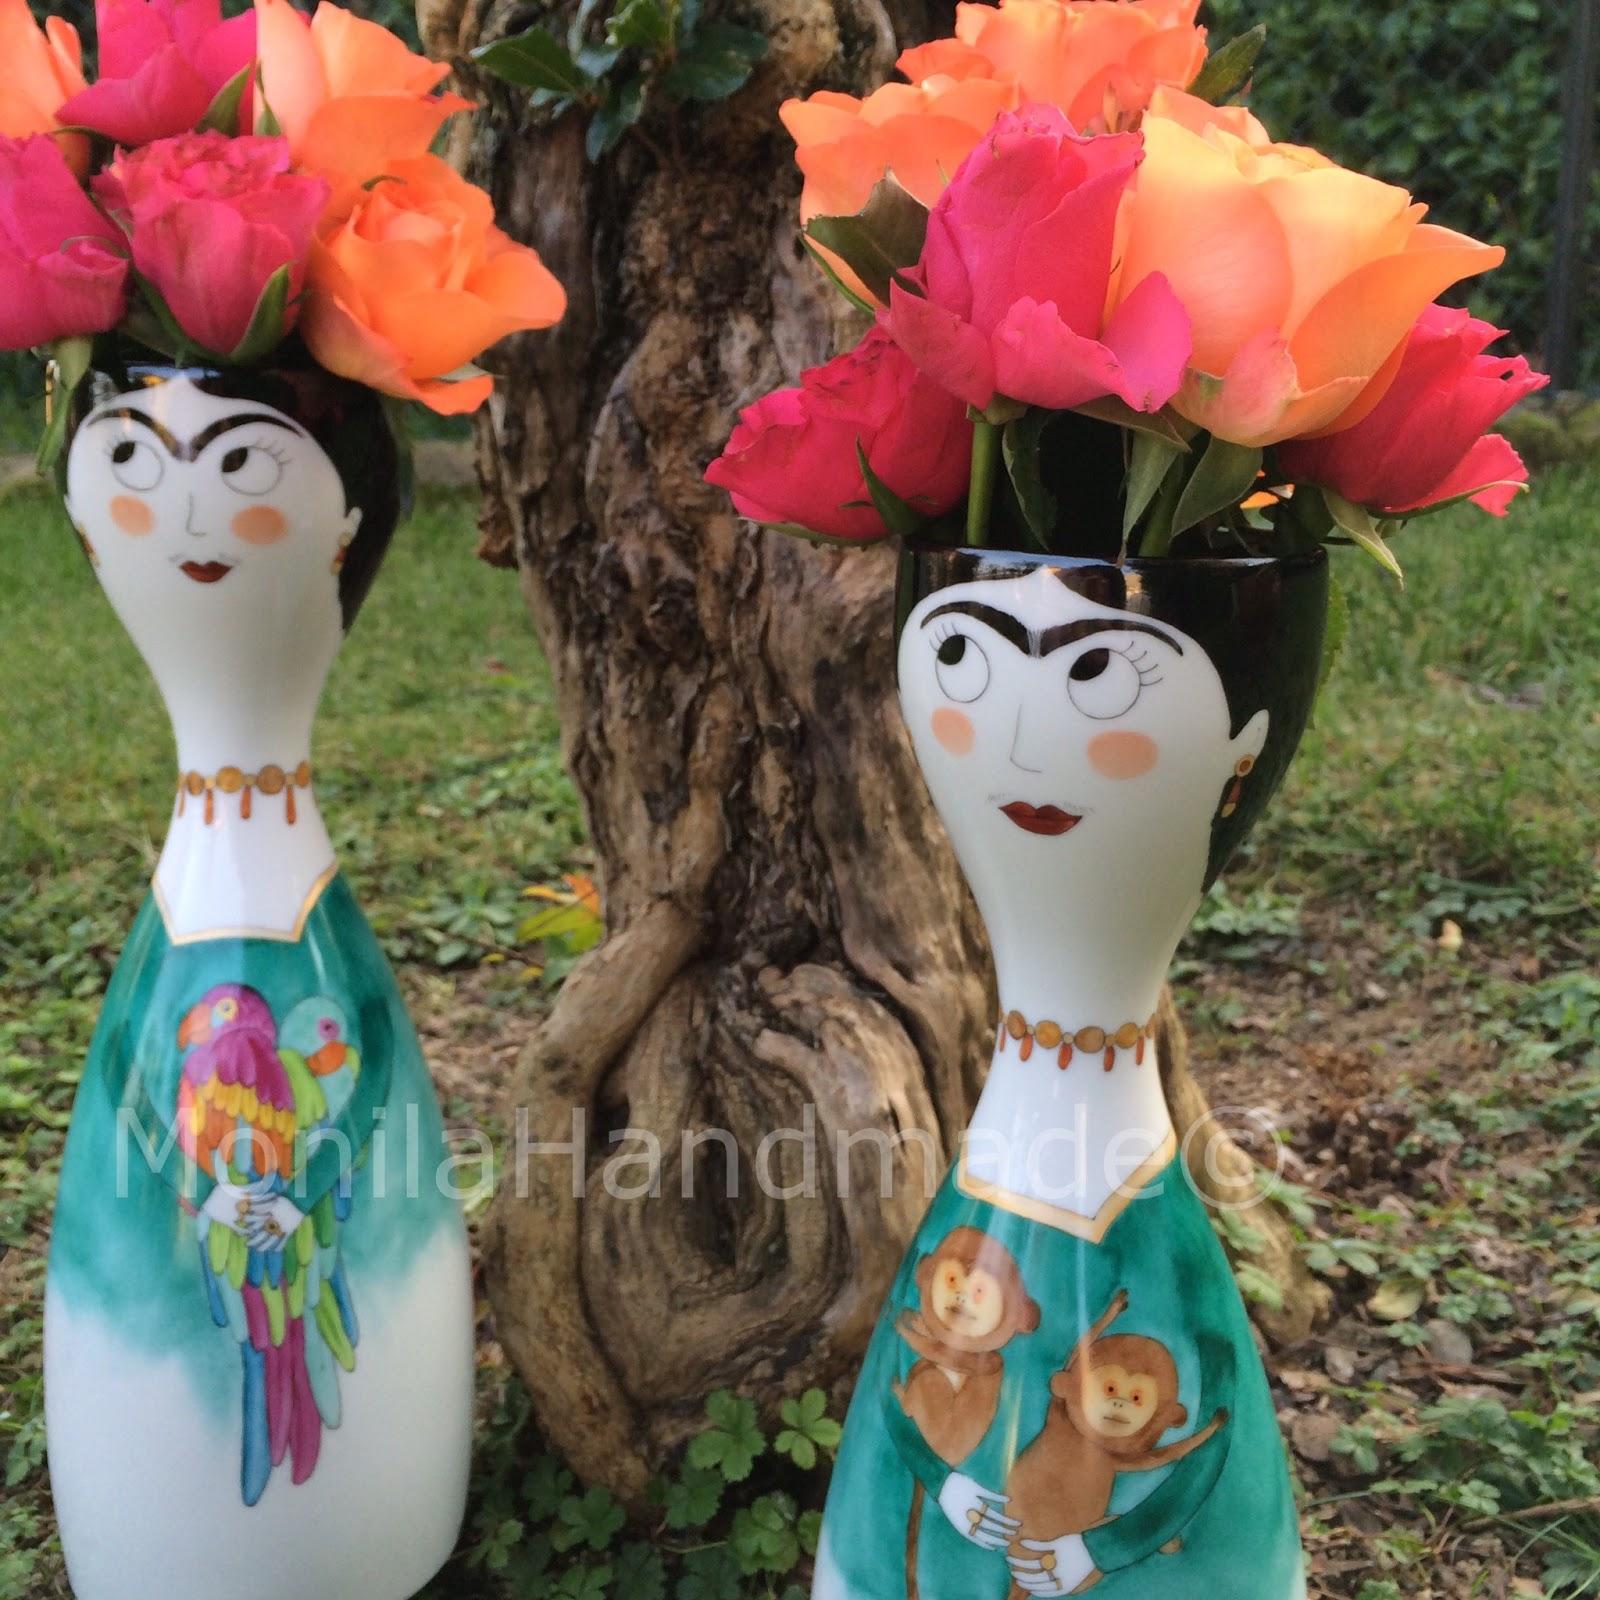 monila Handmade,porcellana,dipinto a mano,Frida kahlo,vaso